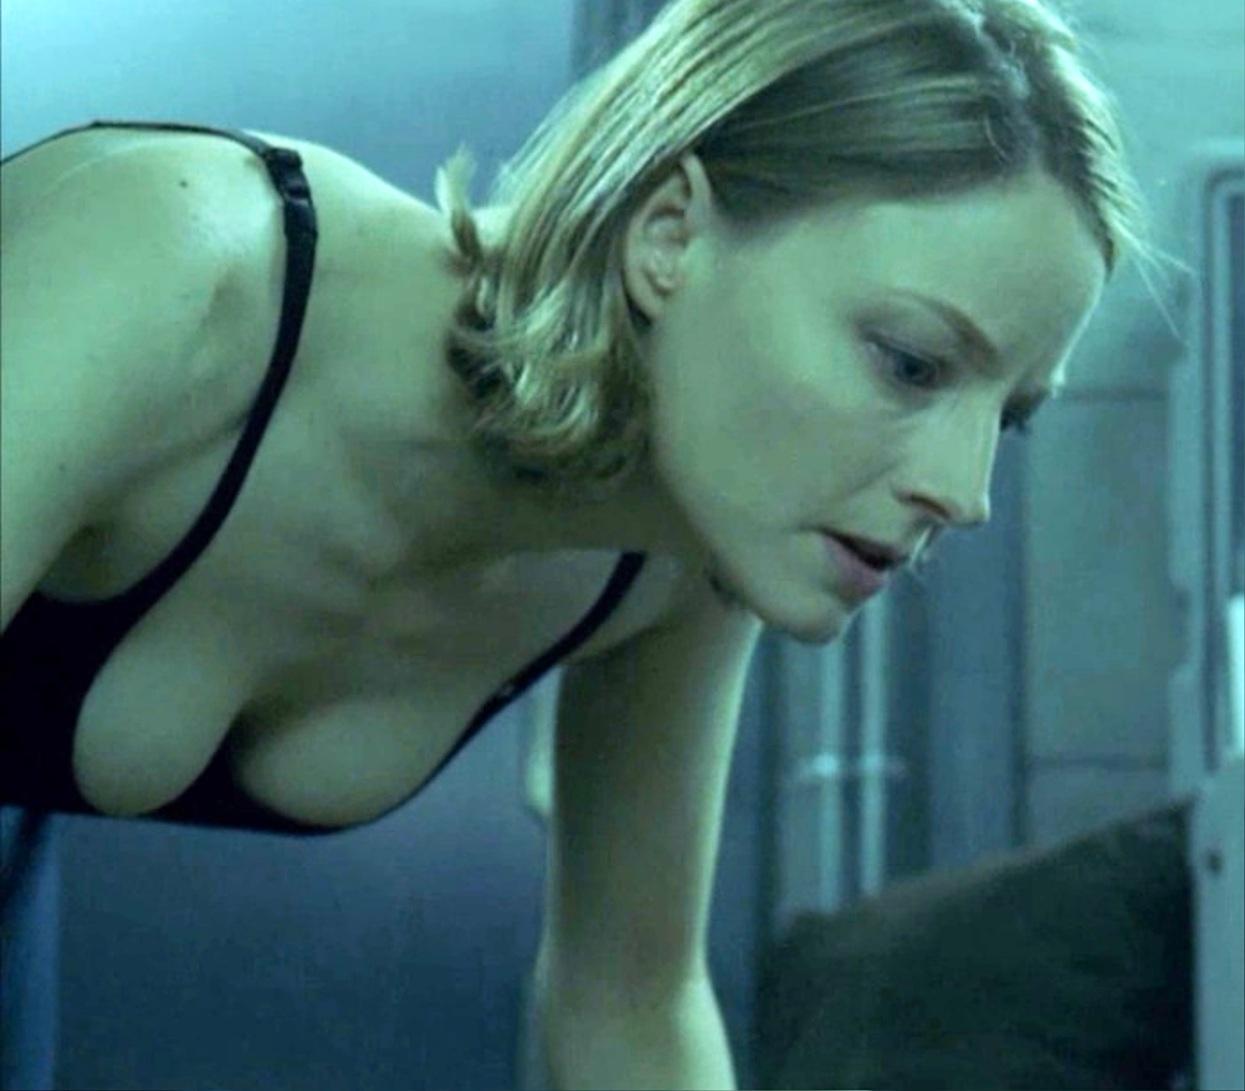 Porn Lesbian Movie Jodie Foster - Jodie foster naked pics - MegaPornX.com